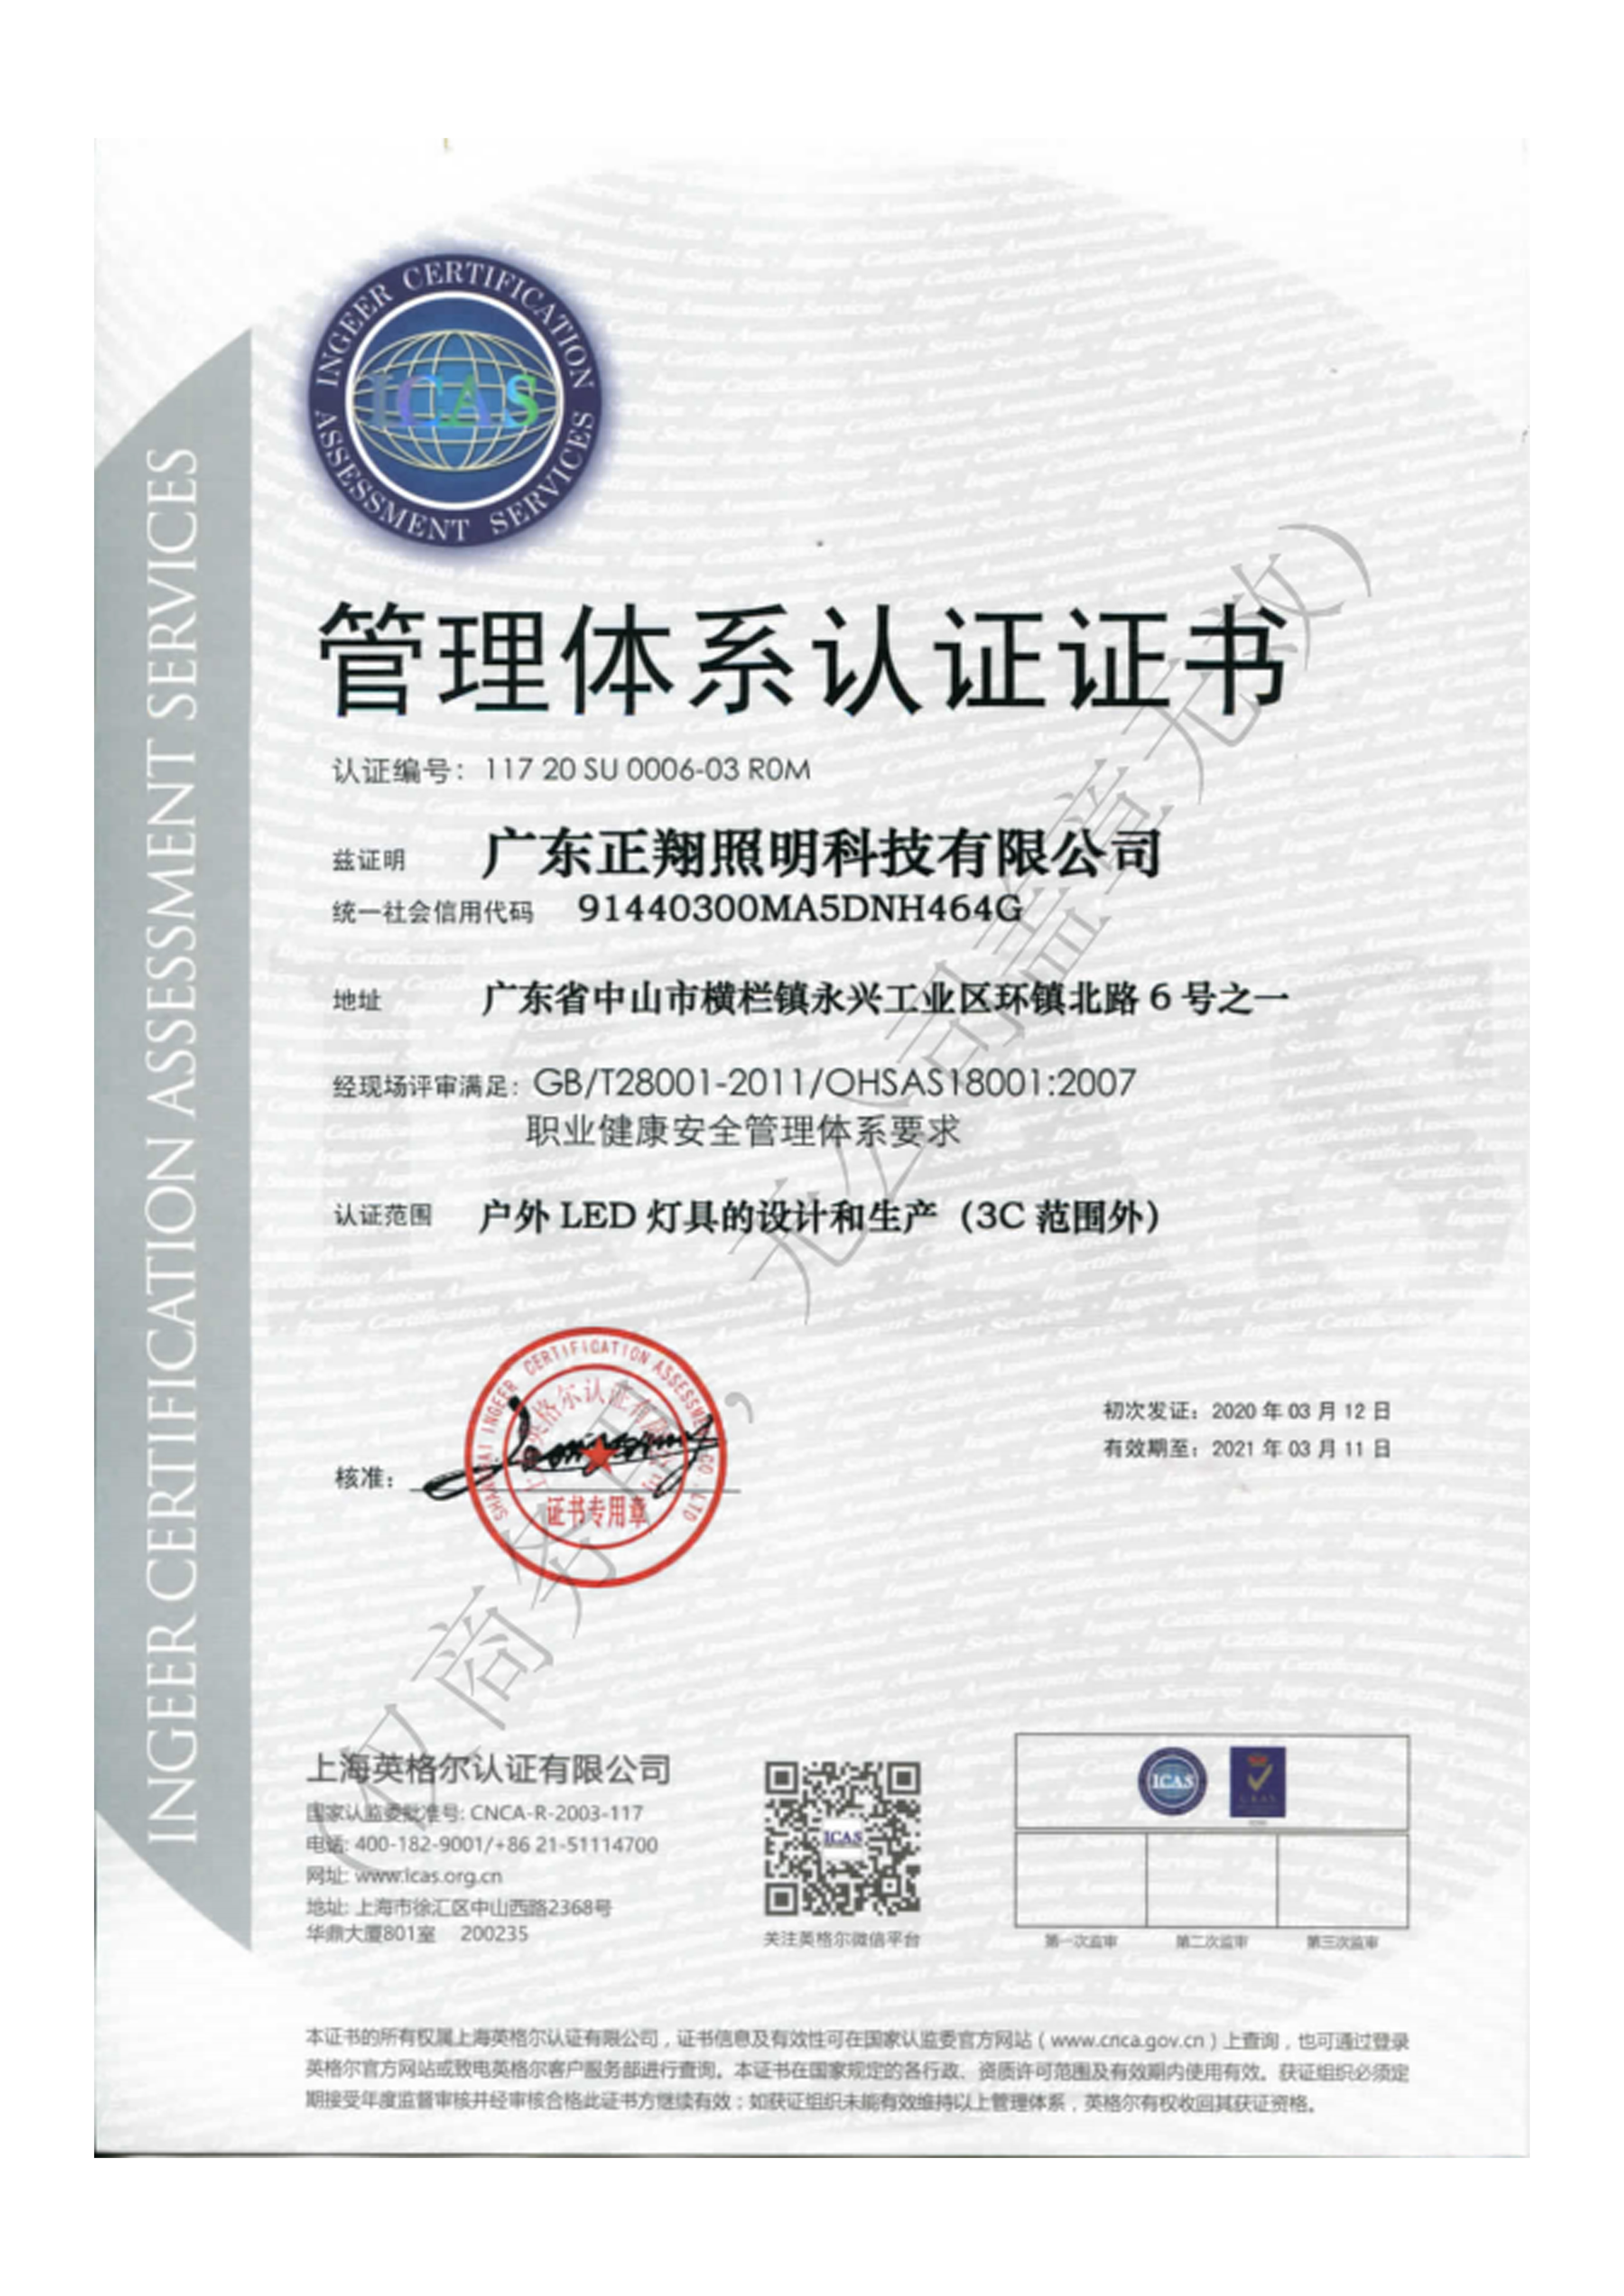 正翔照明ISO三体系证书